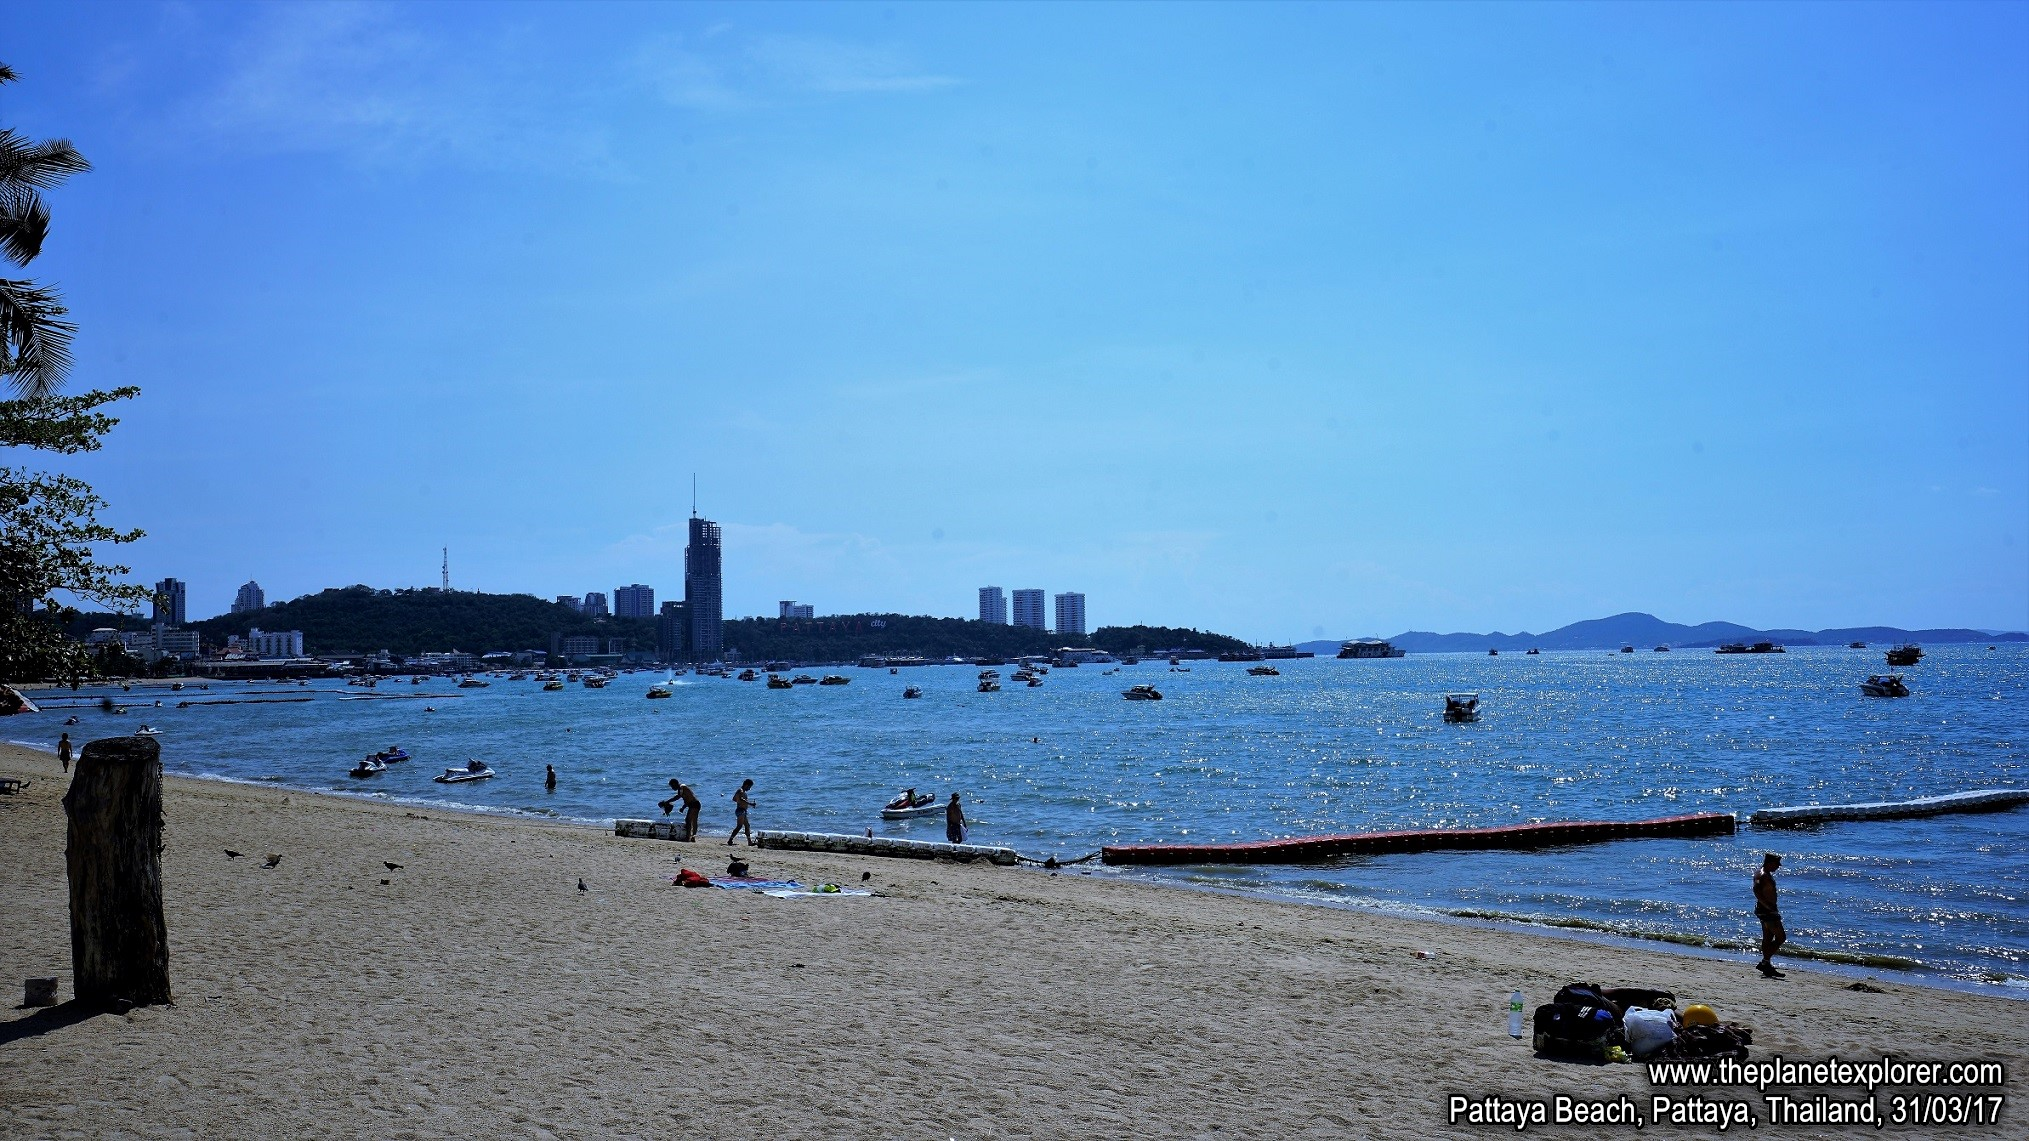 2017-03-31_1452_Thailand_Pattaya_Pattaya Beach_DSC03926_s7R2_LR_@